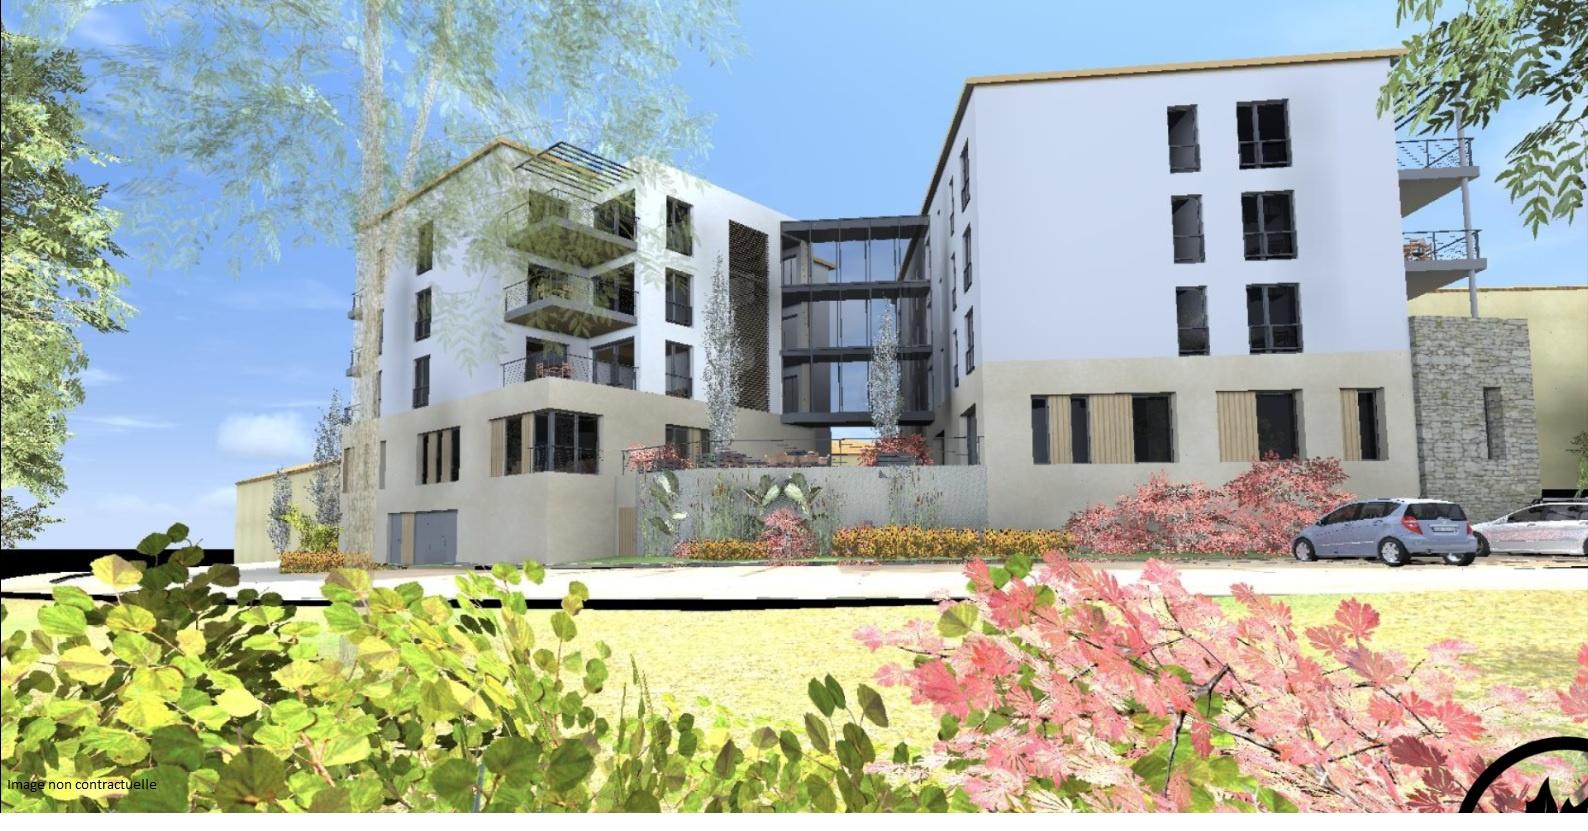 Offres programmes neufs t3 r 2 - Fiscalite location meublee non professionnelle ...